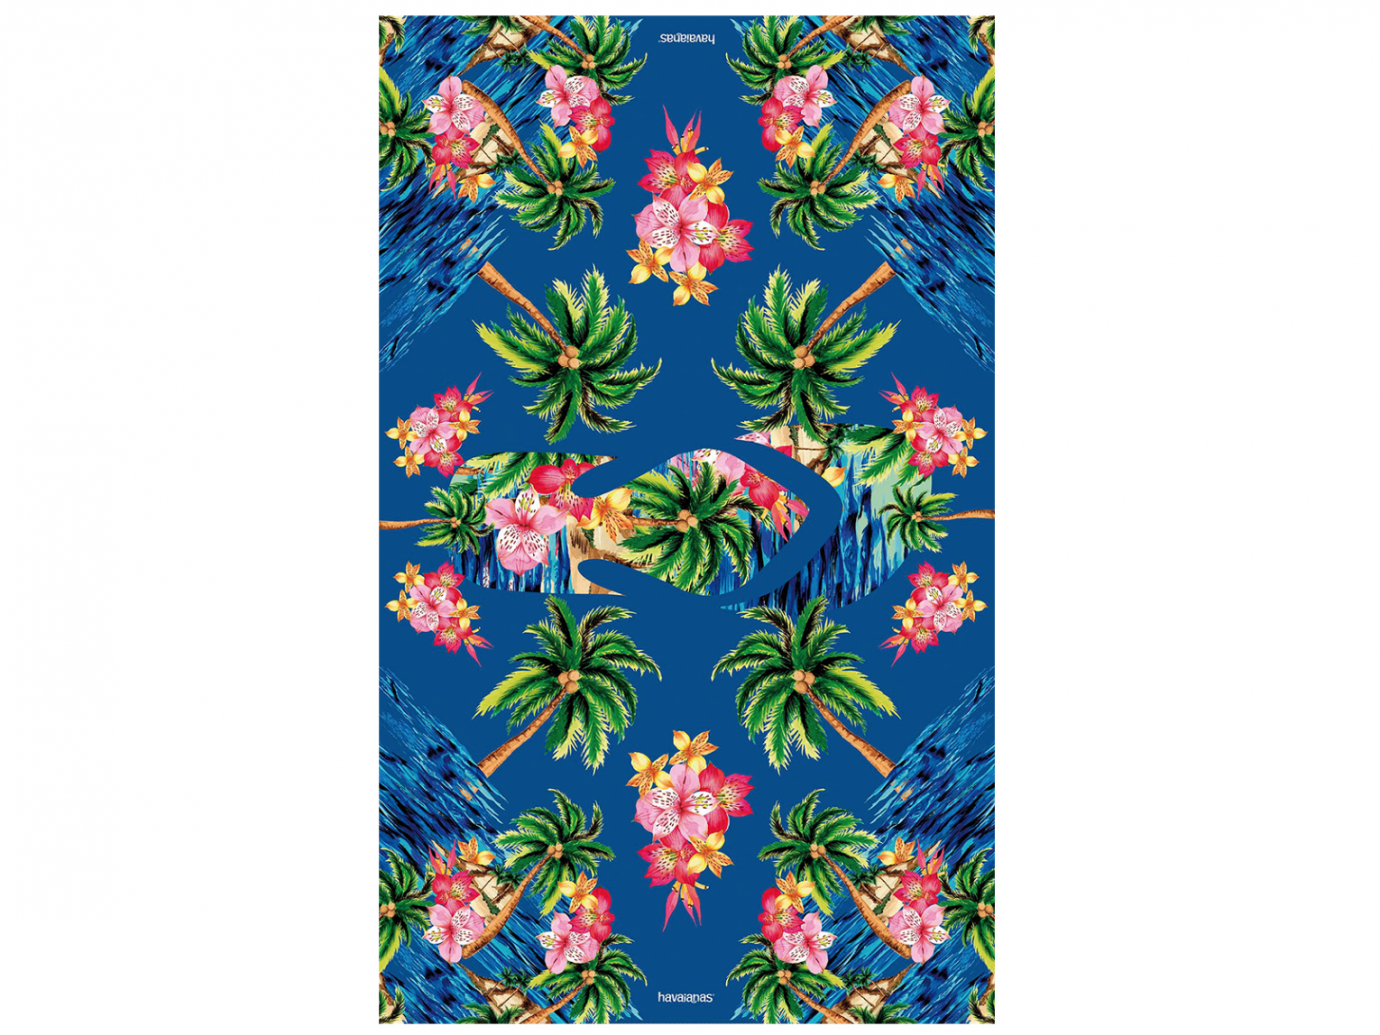 CANGA FLORAL BLUE multifunctional sarong